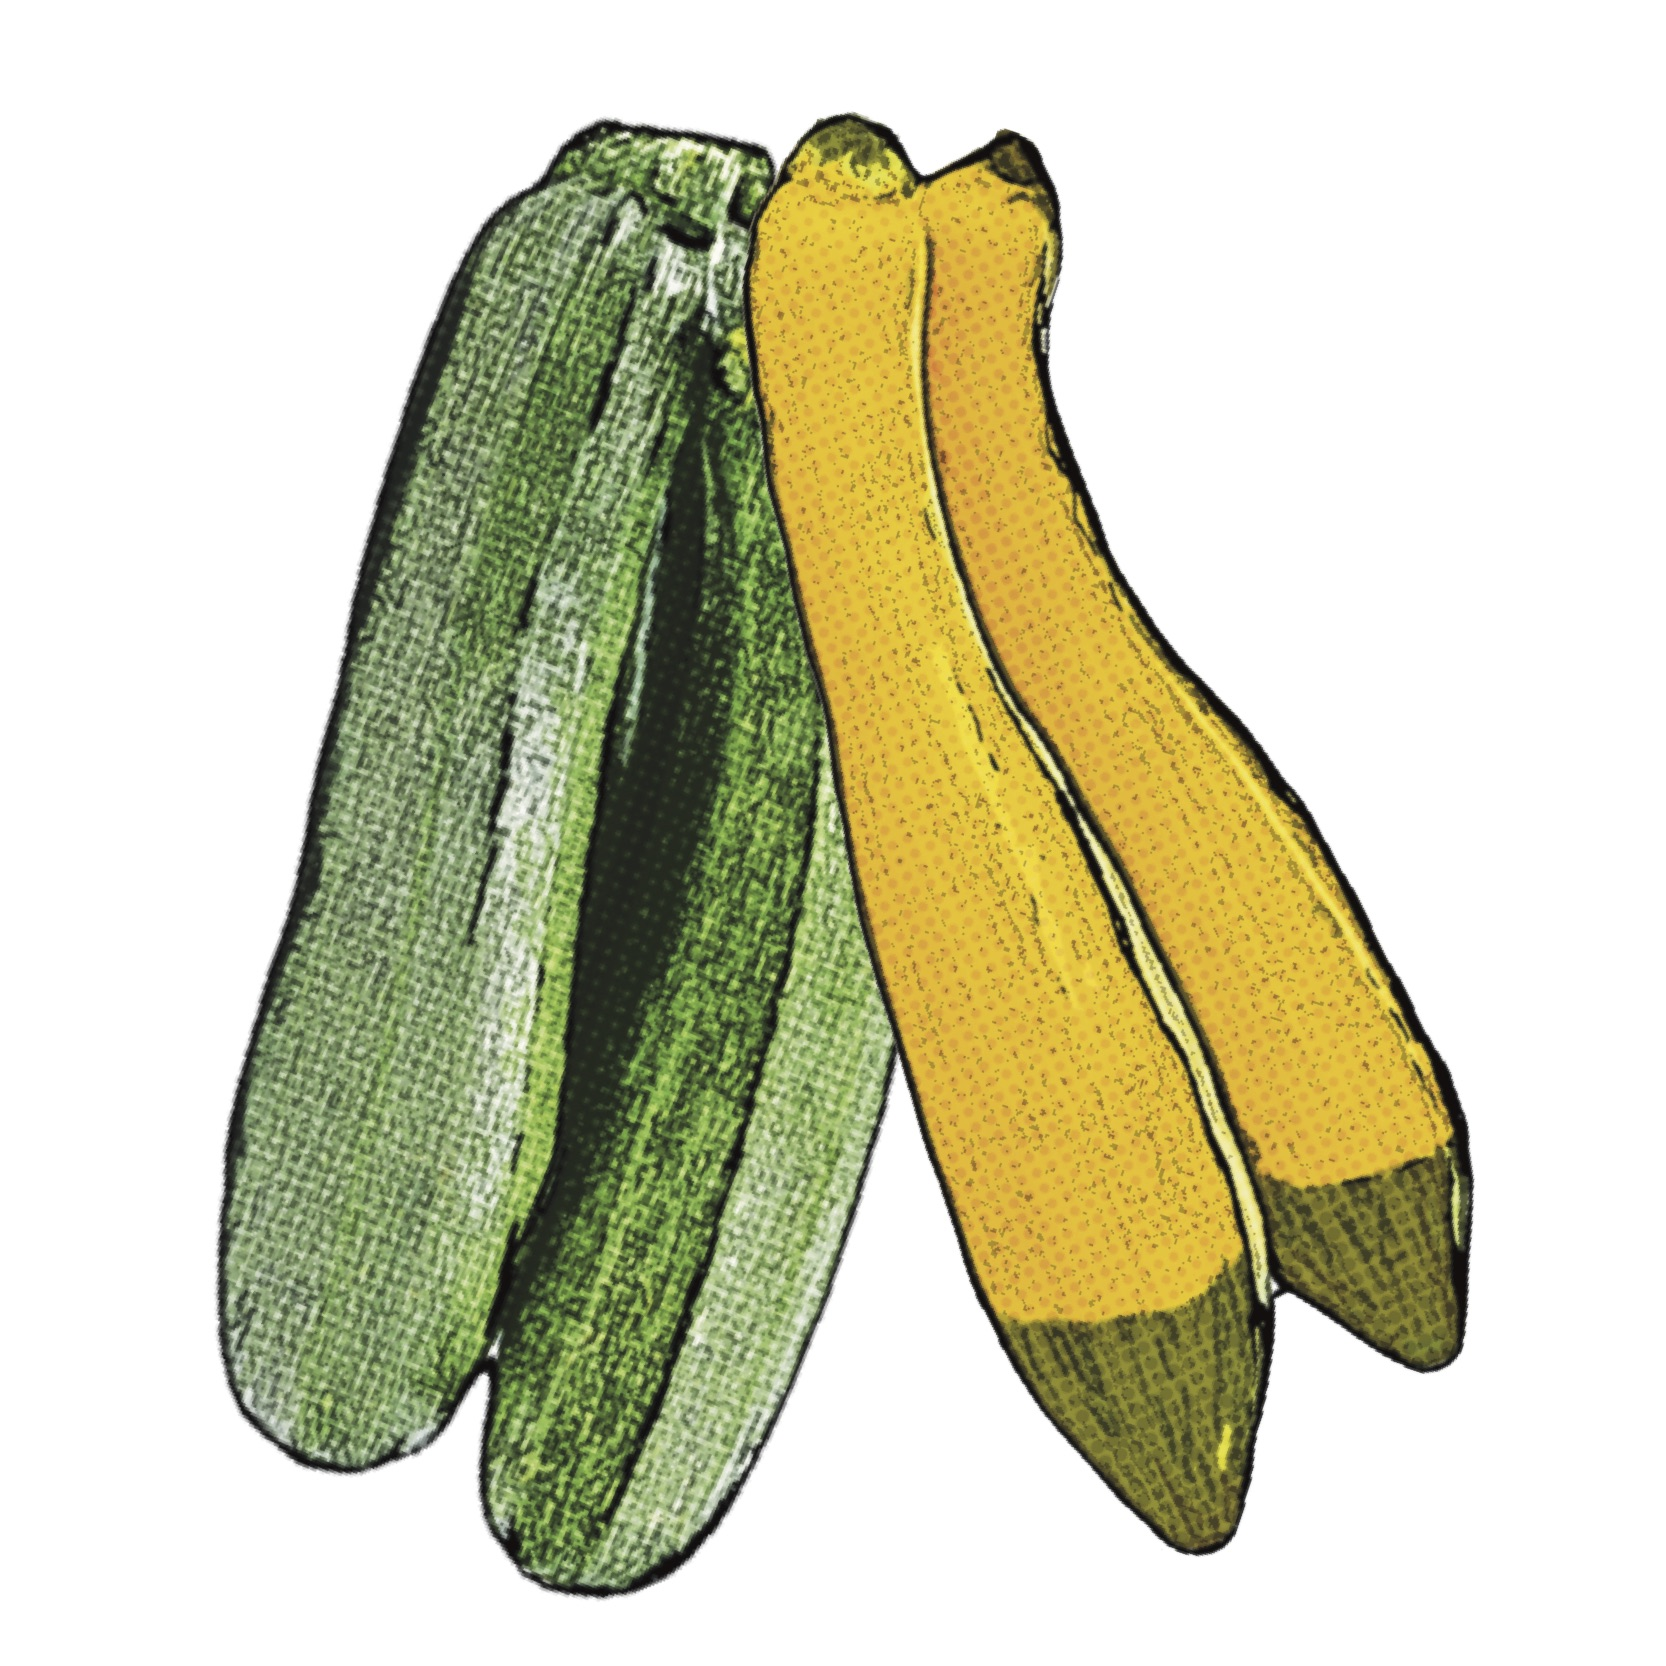 Find Summer Squash Recipes